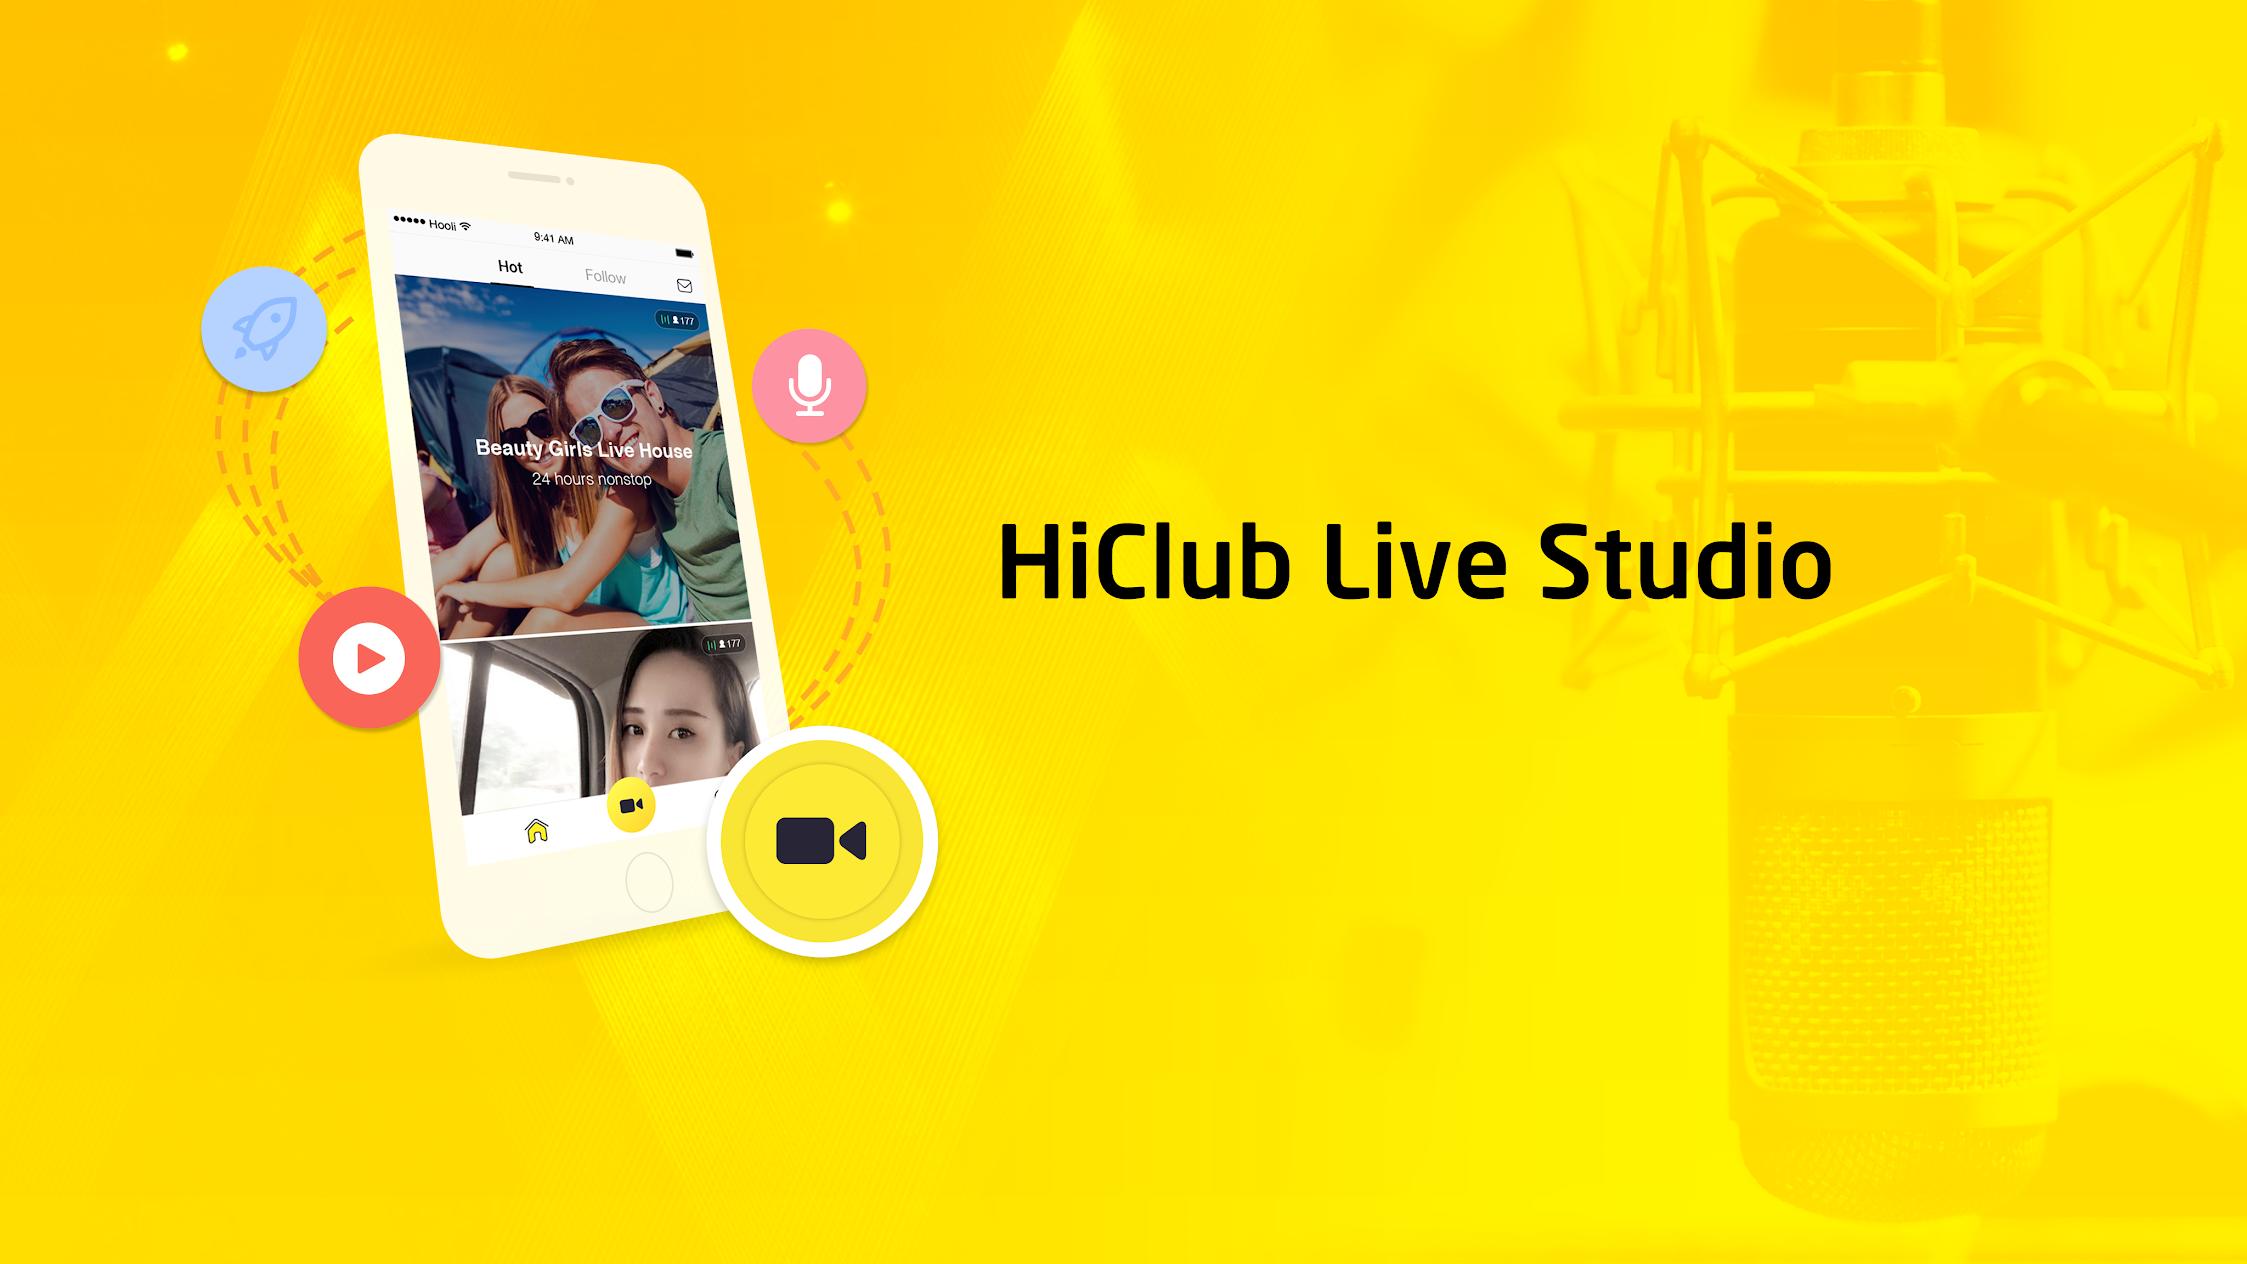 HiClub Live Streaming